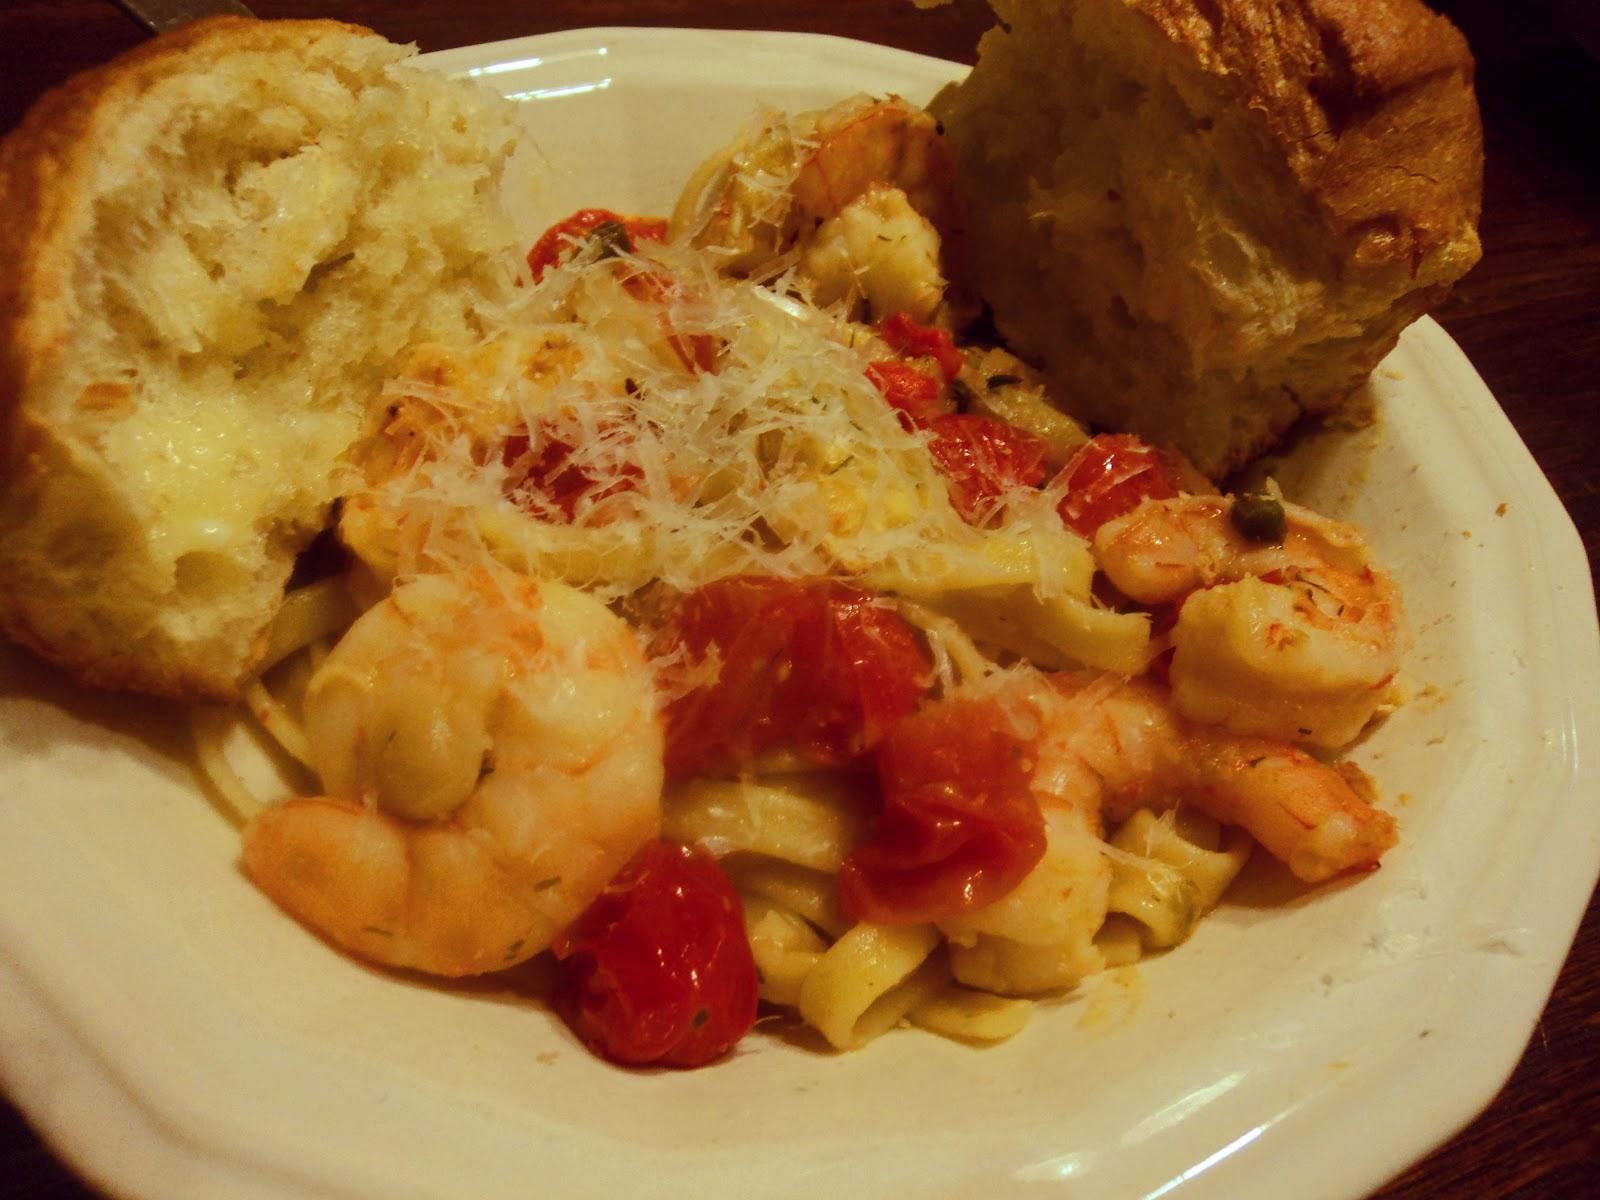 ... shrimp and fettuccine angel hair pasta with shrimp shrimp and